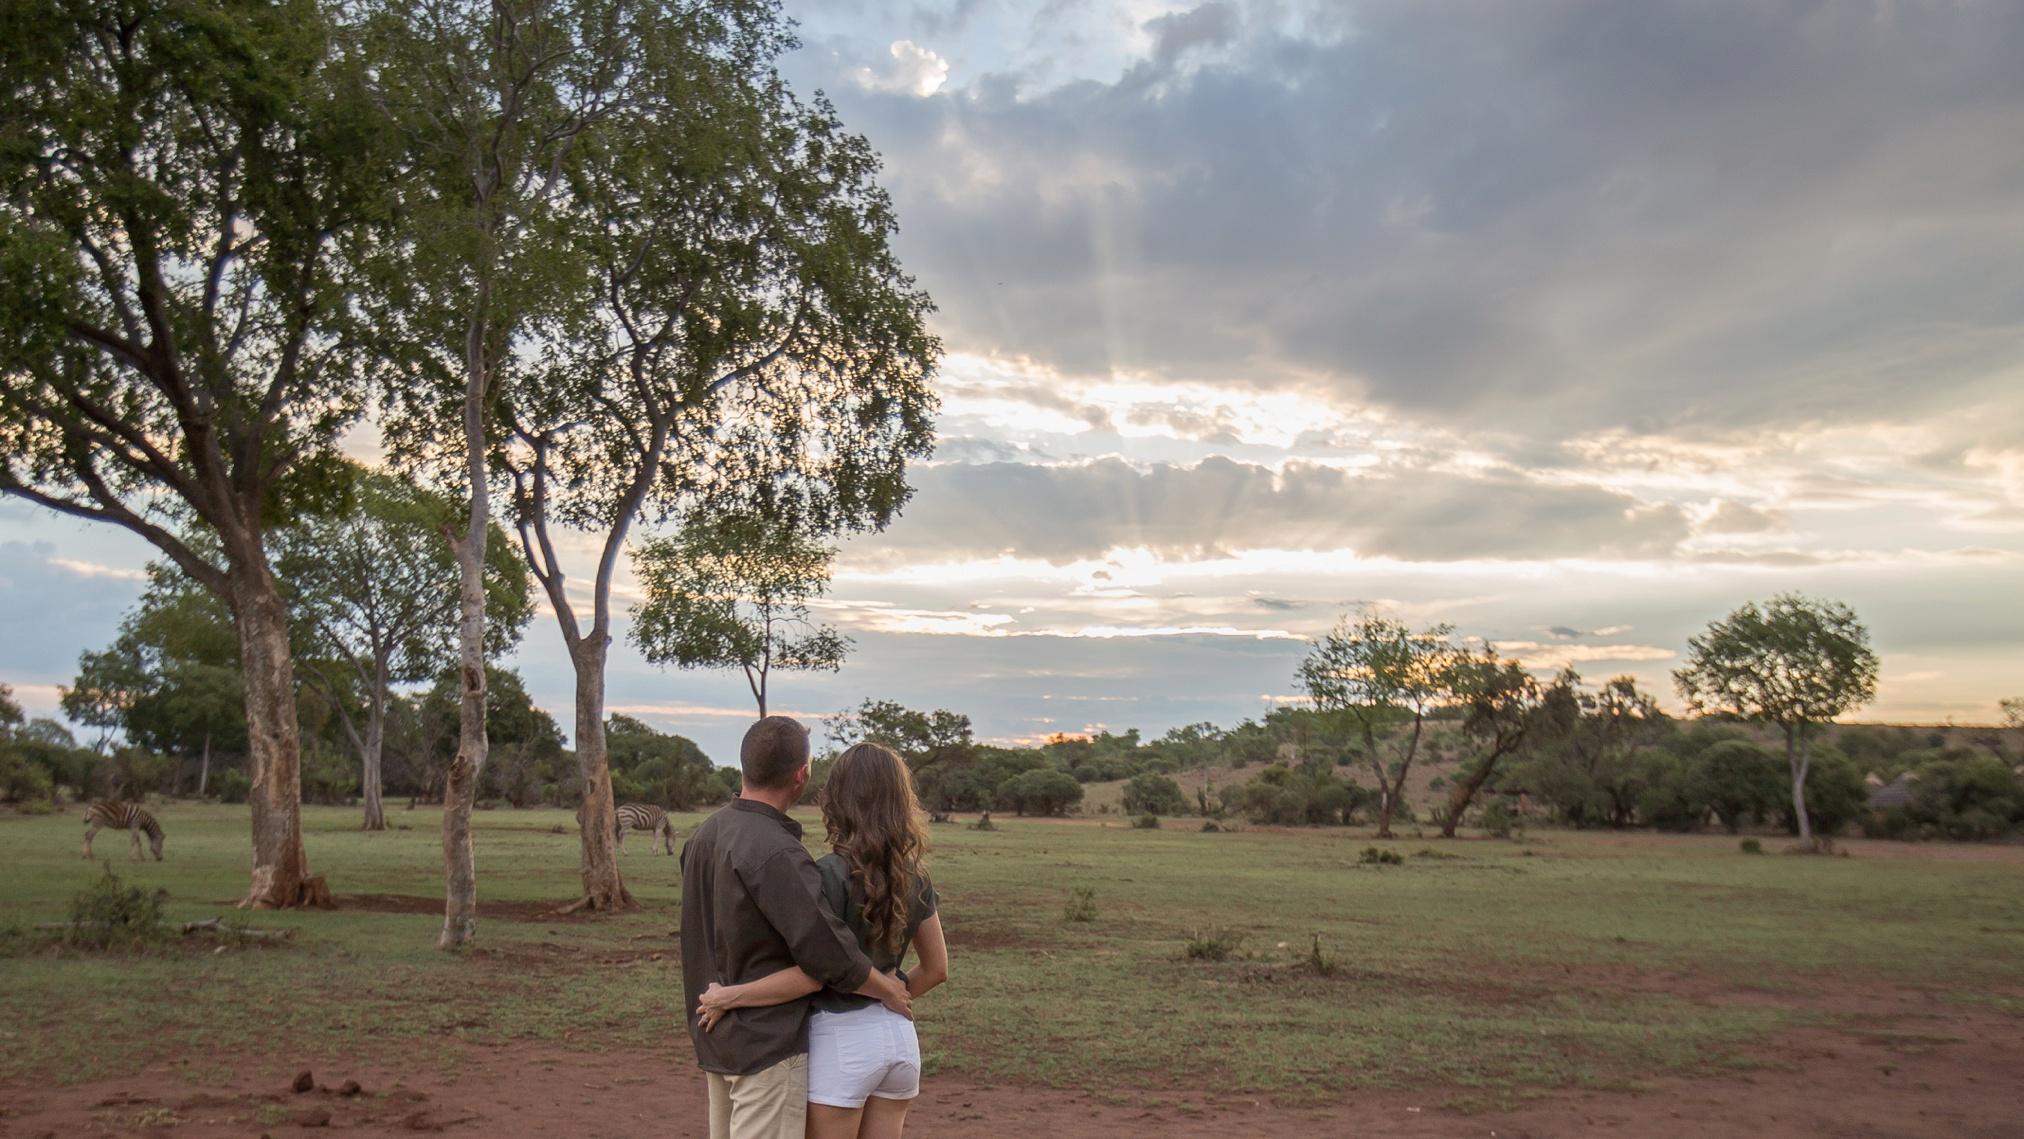 Glen_Afric_Kyle_and_Lindsay_engagement_elephants_safari_27